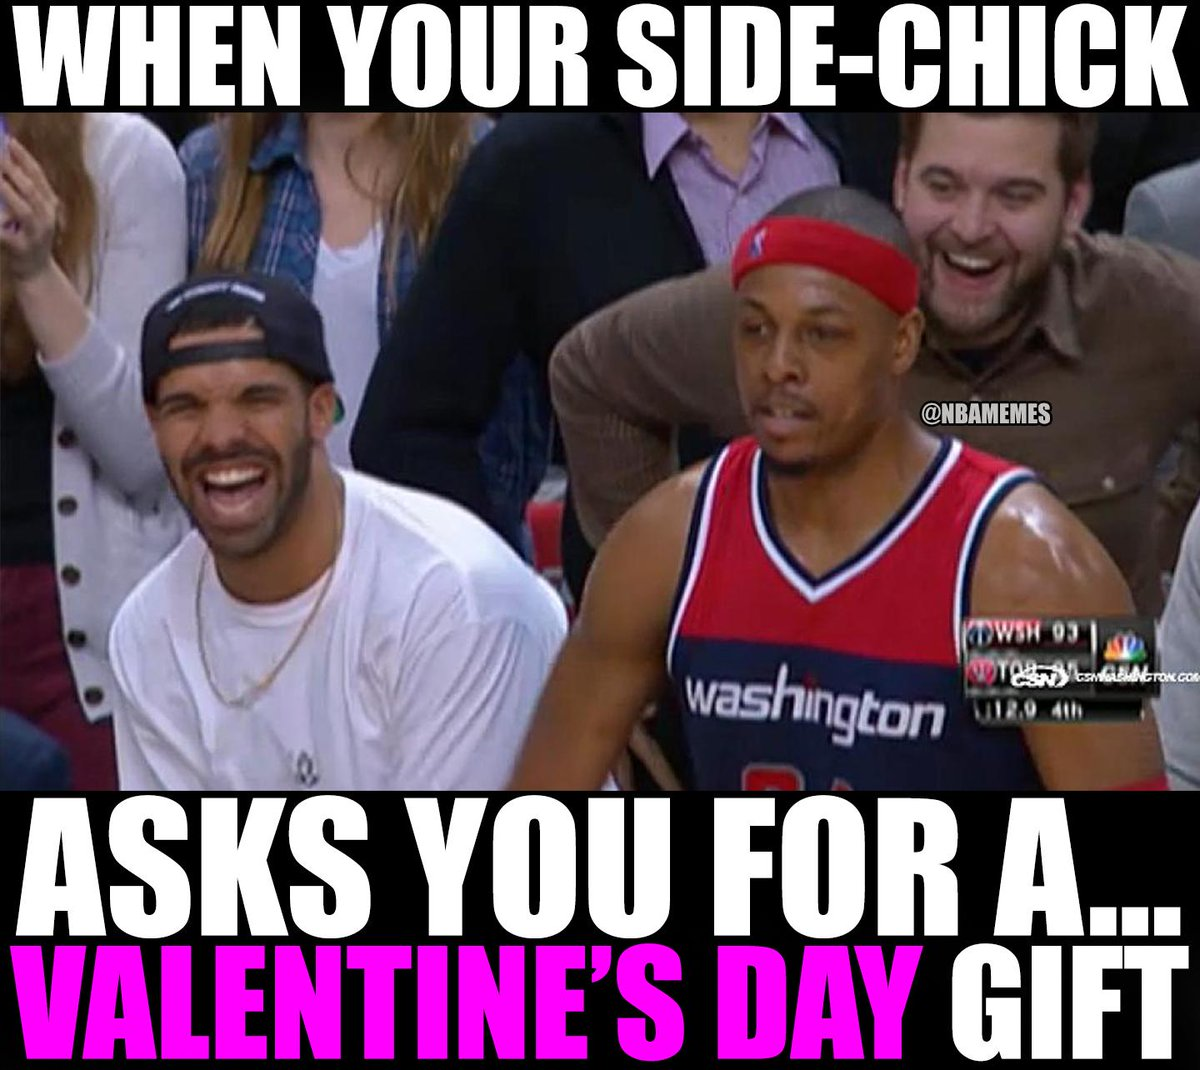 Nba Memes On Twitter Paul Pierce Pushing Drake Away On Valentine S Day Wizards Http T Co Qpqzdsrrr2